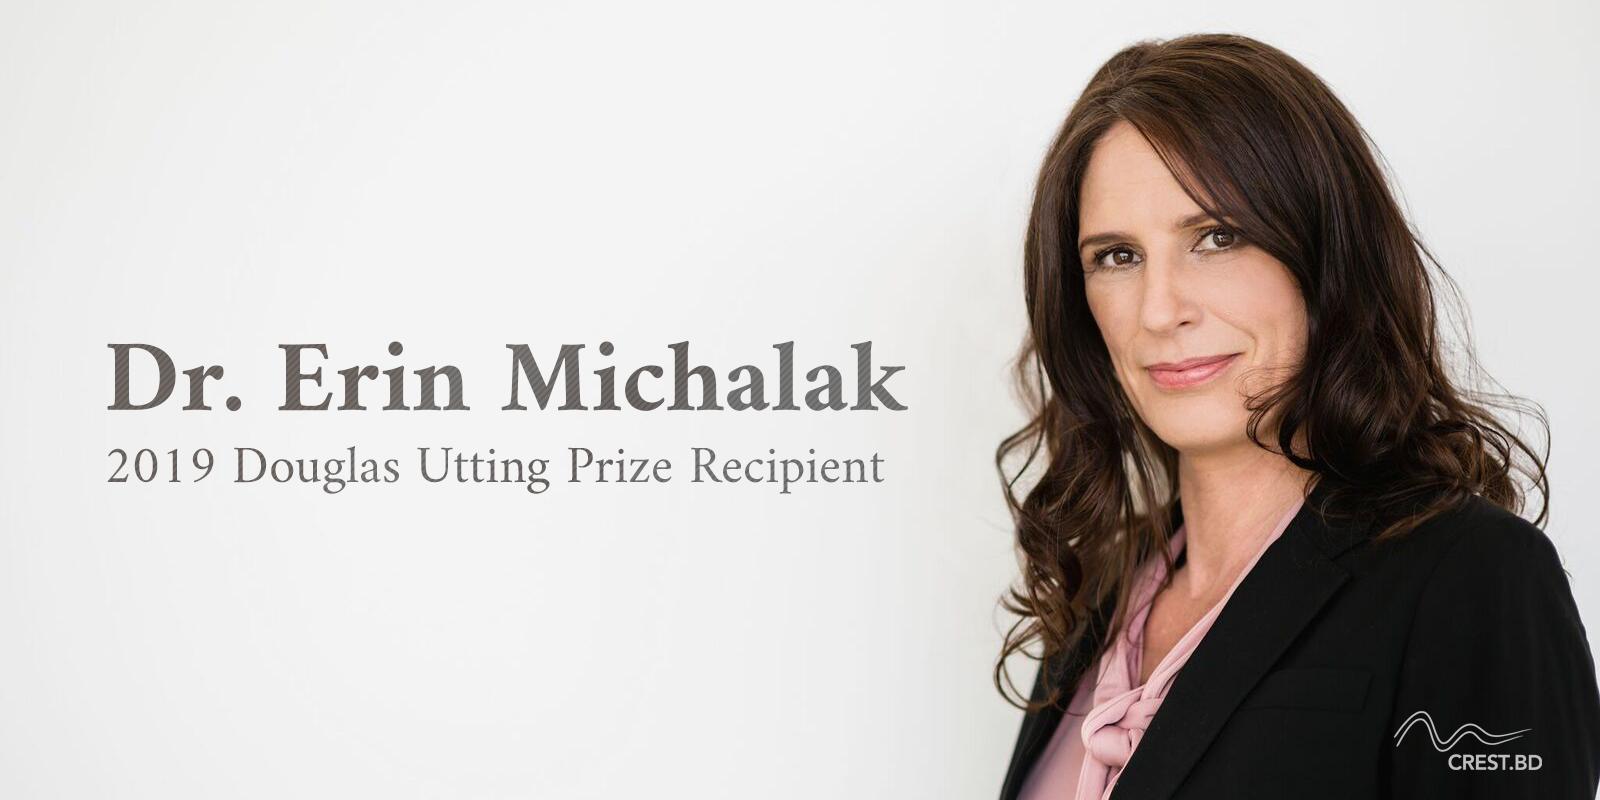 Erin Michalak awarded the Douglas Utting Prize